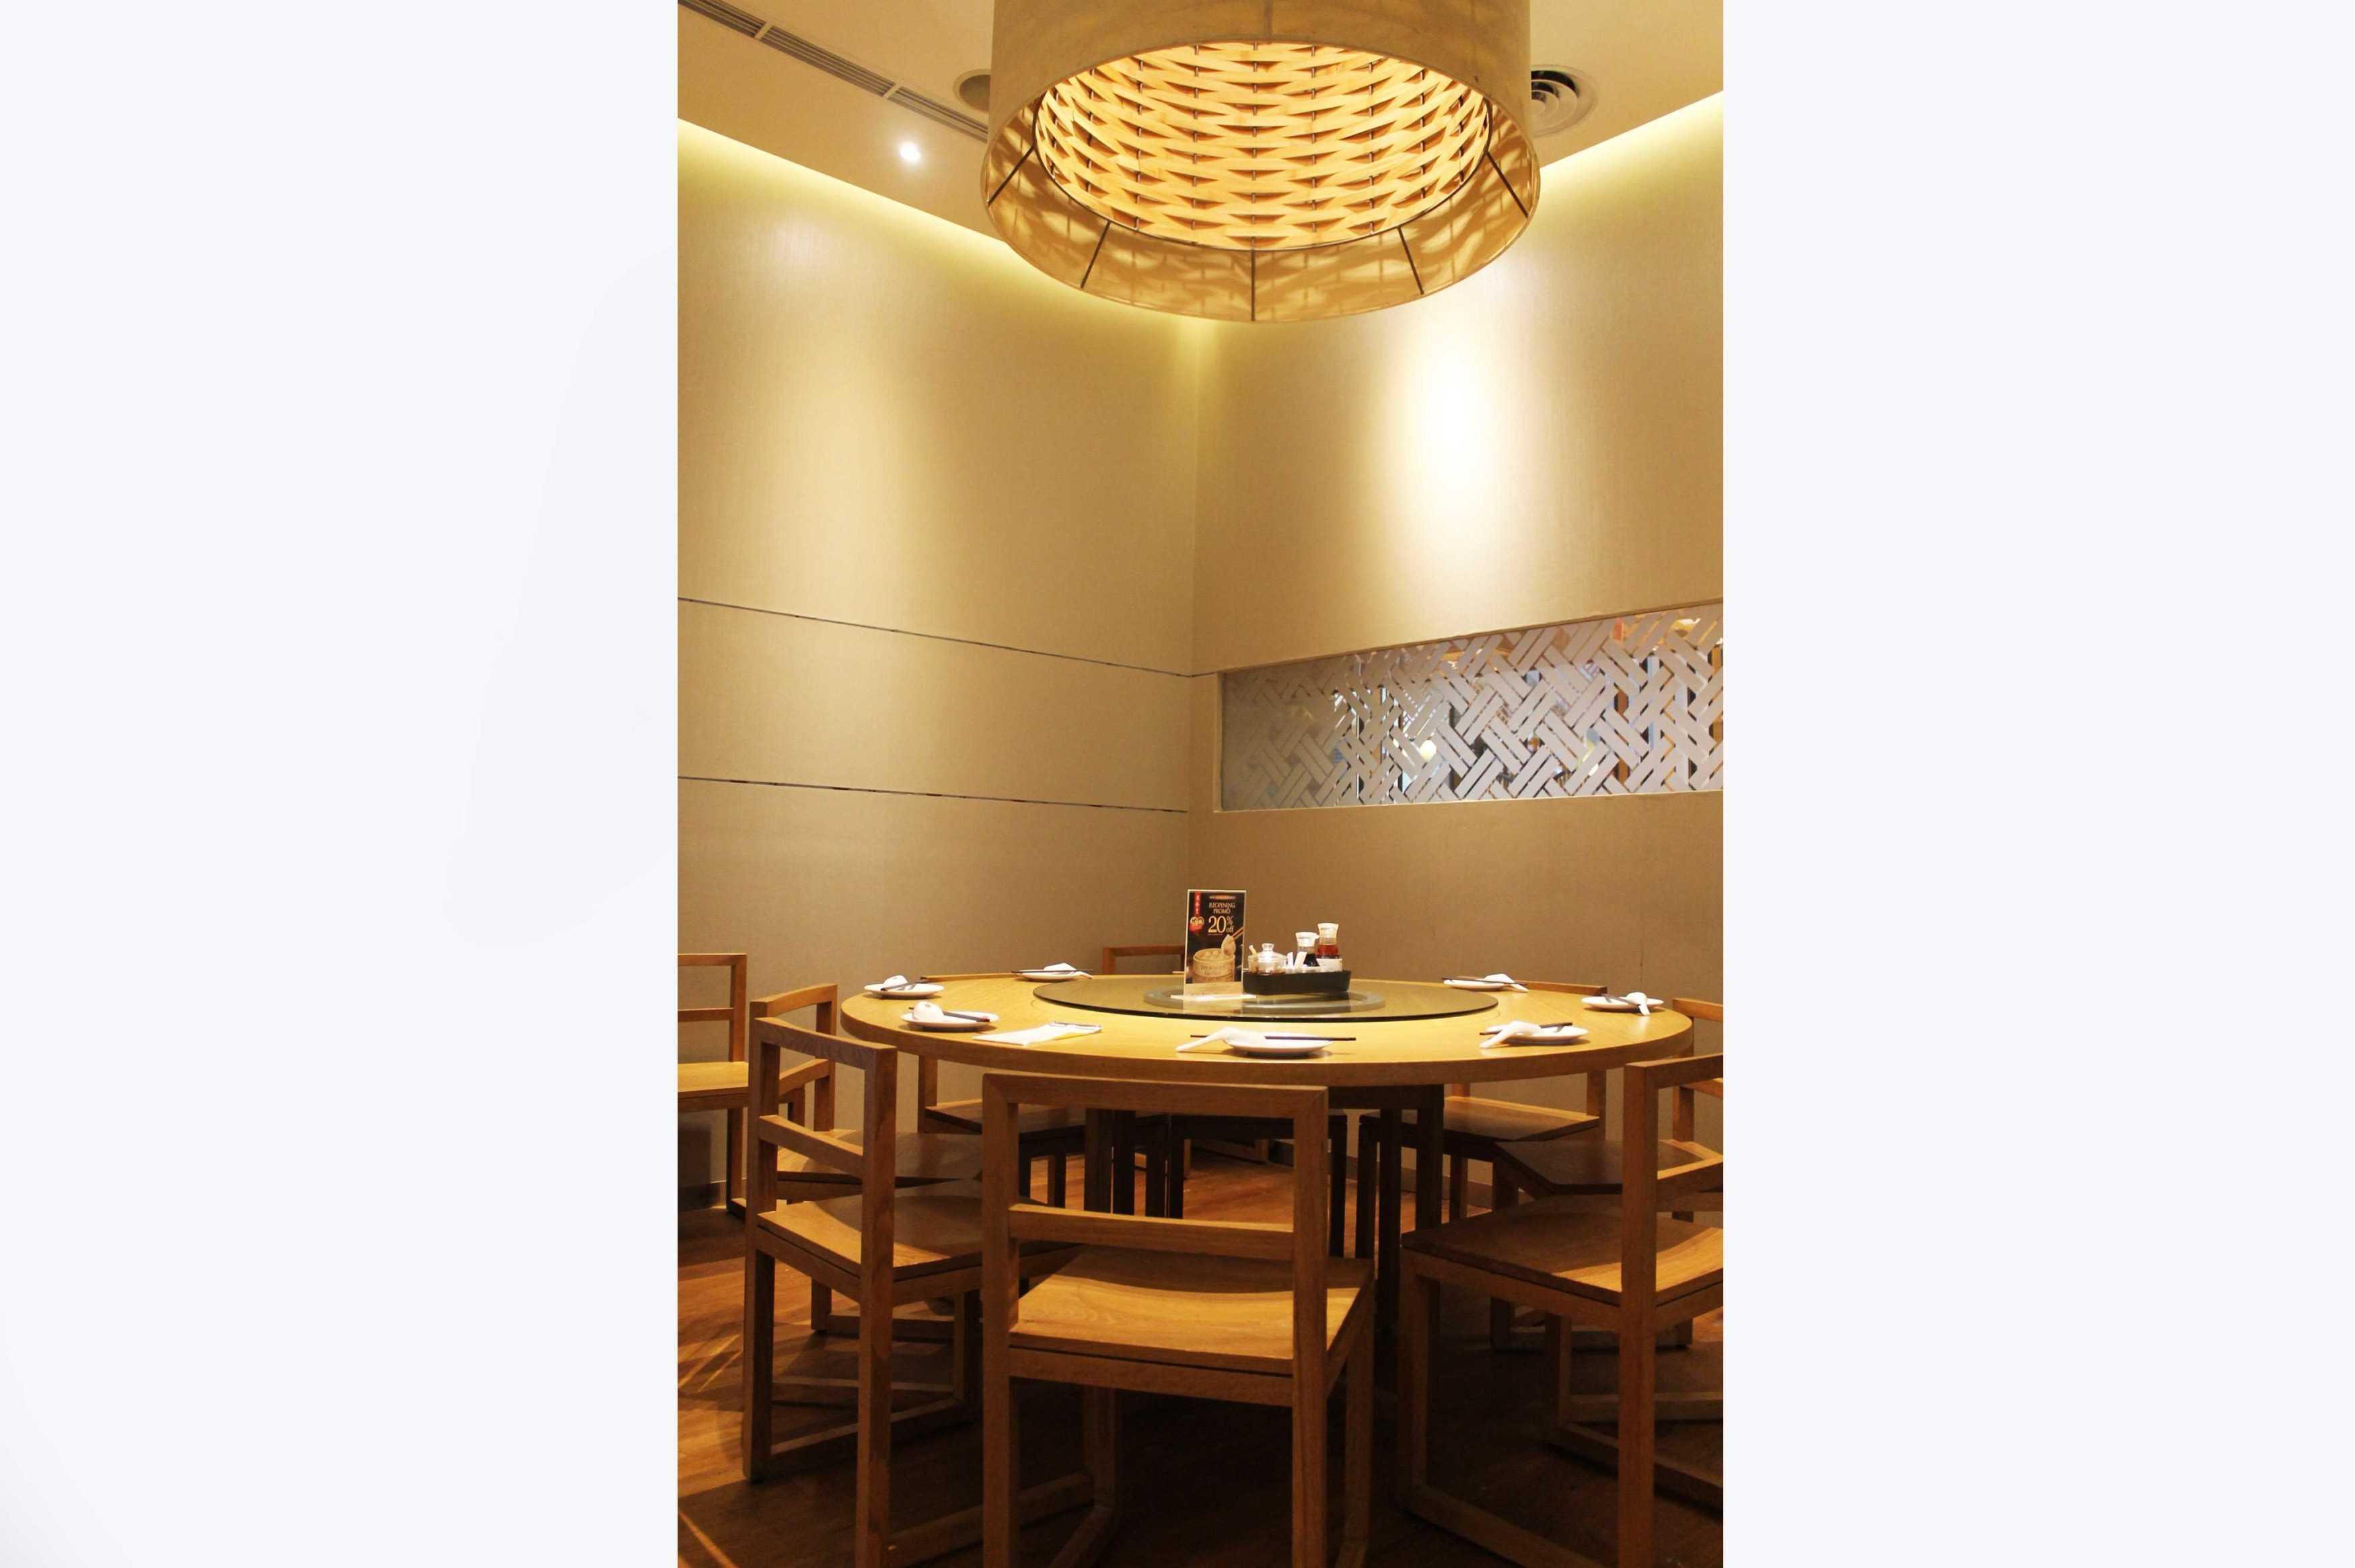 Rully Tanuwidjaja Interior Din Tai Fung Restaurant (Senayan) Plaza Arcadia Senayan, Jl. New Dhelhi, Gelora, Tanahabang, Central Jakarta City, Jakarta 10270, Indonesia  Vip Kontemporer  48543